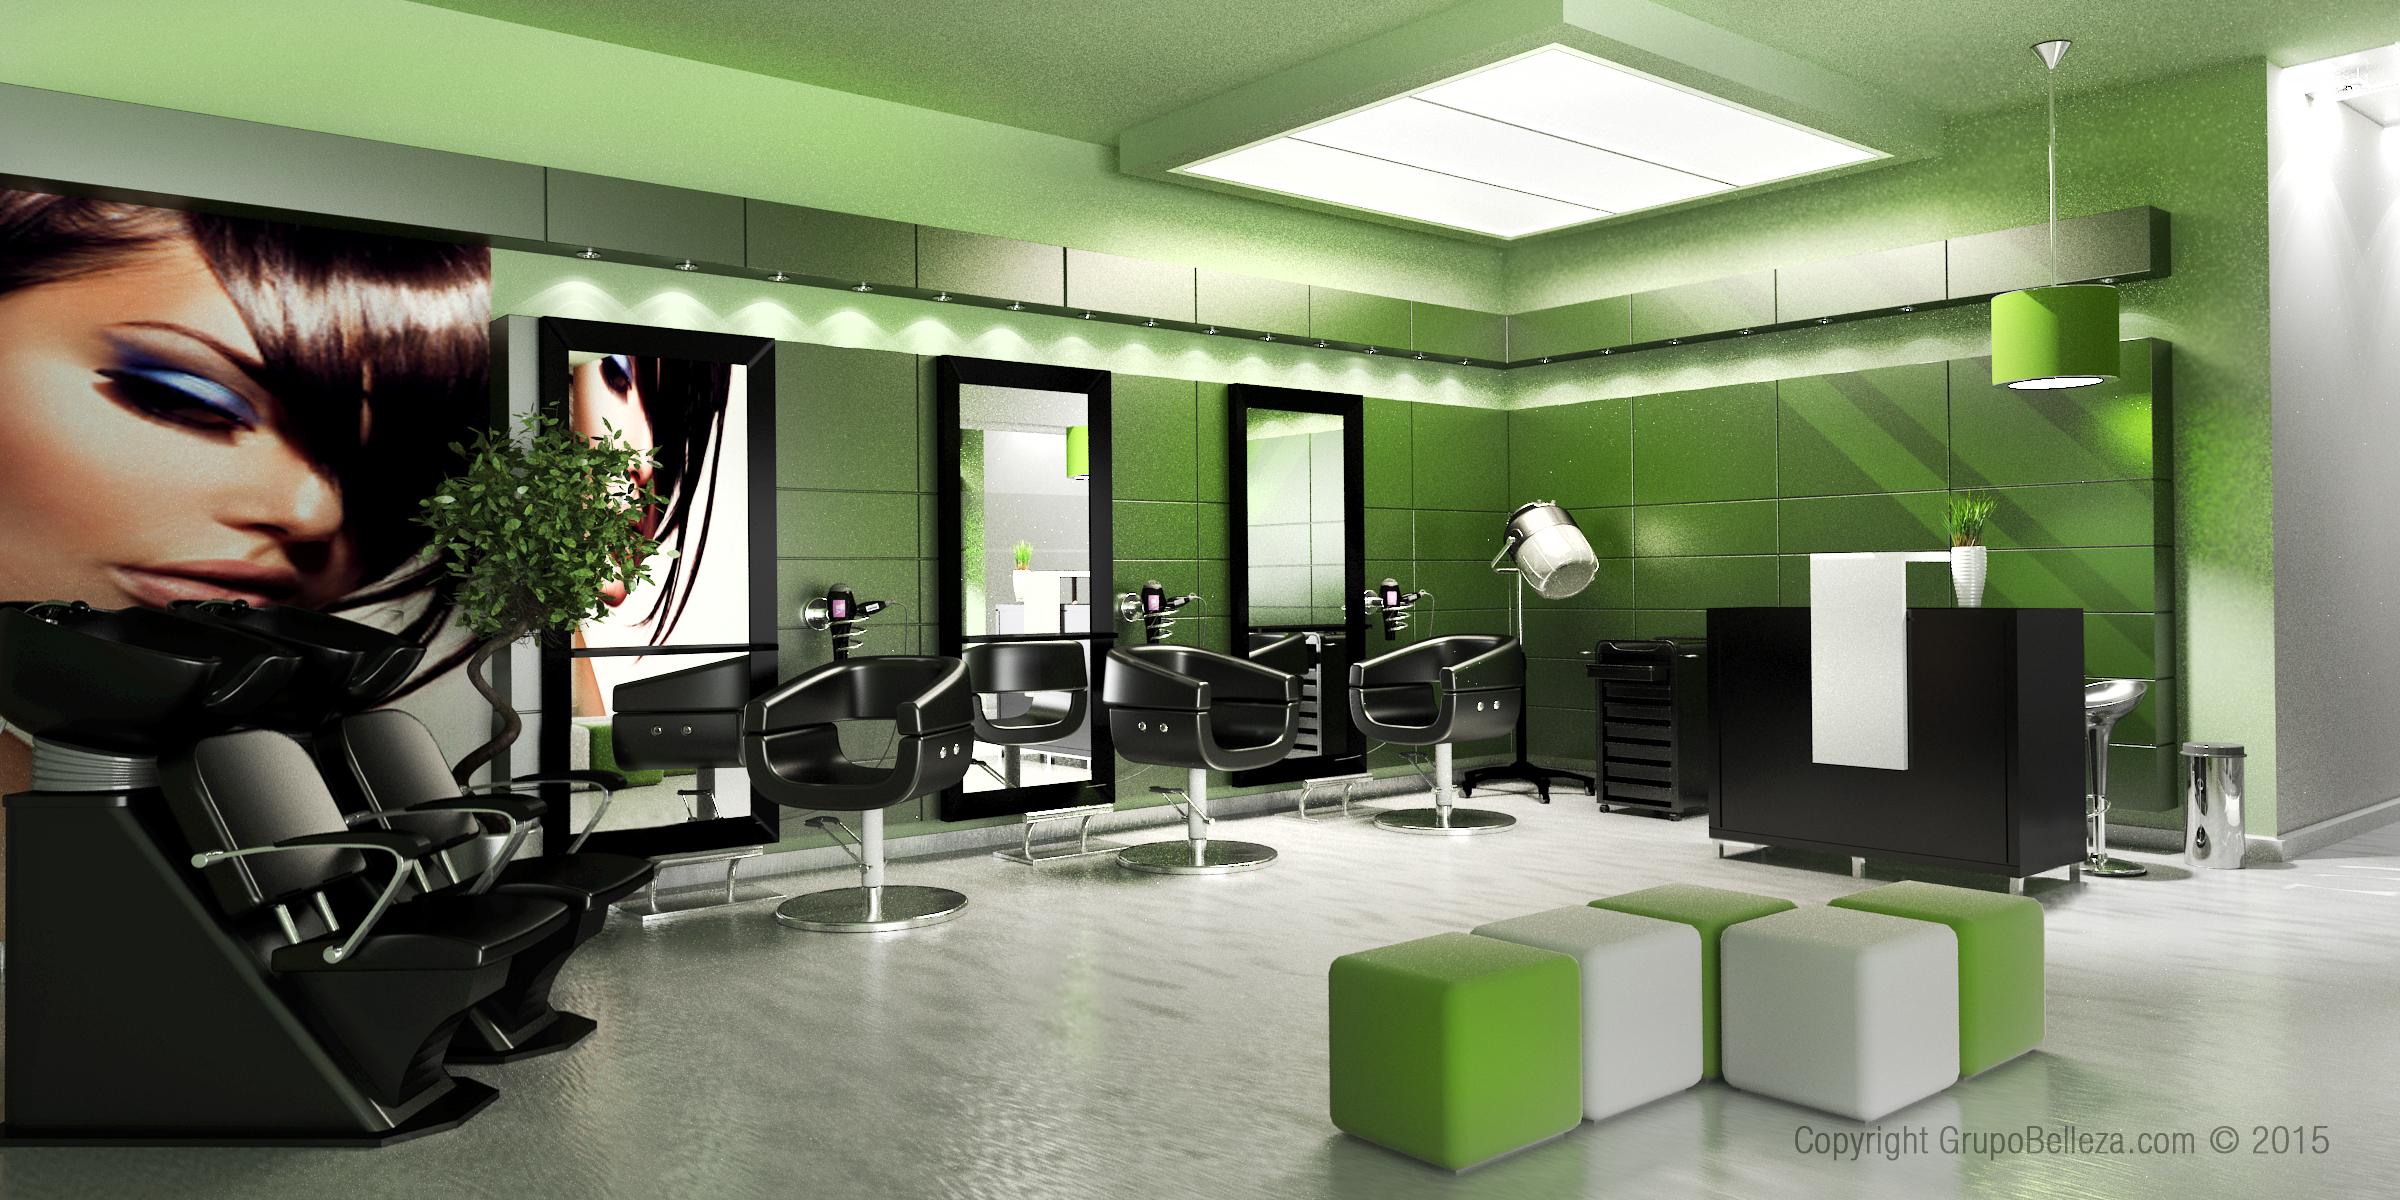 Conjunto misku estudio de dise o 3d barcelona blog - Diseno peluqueria ...